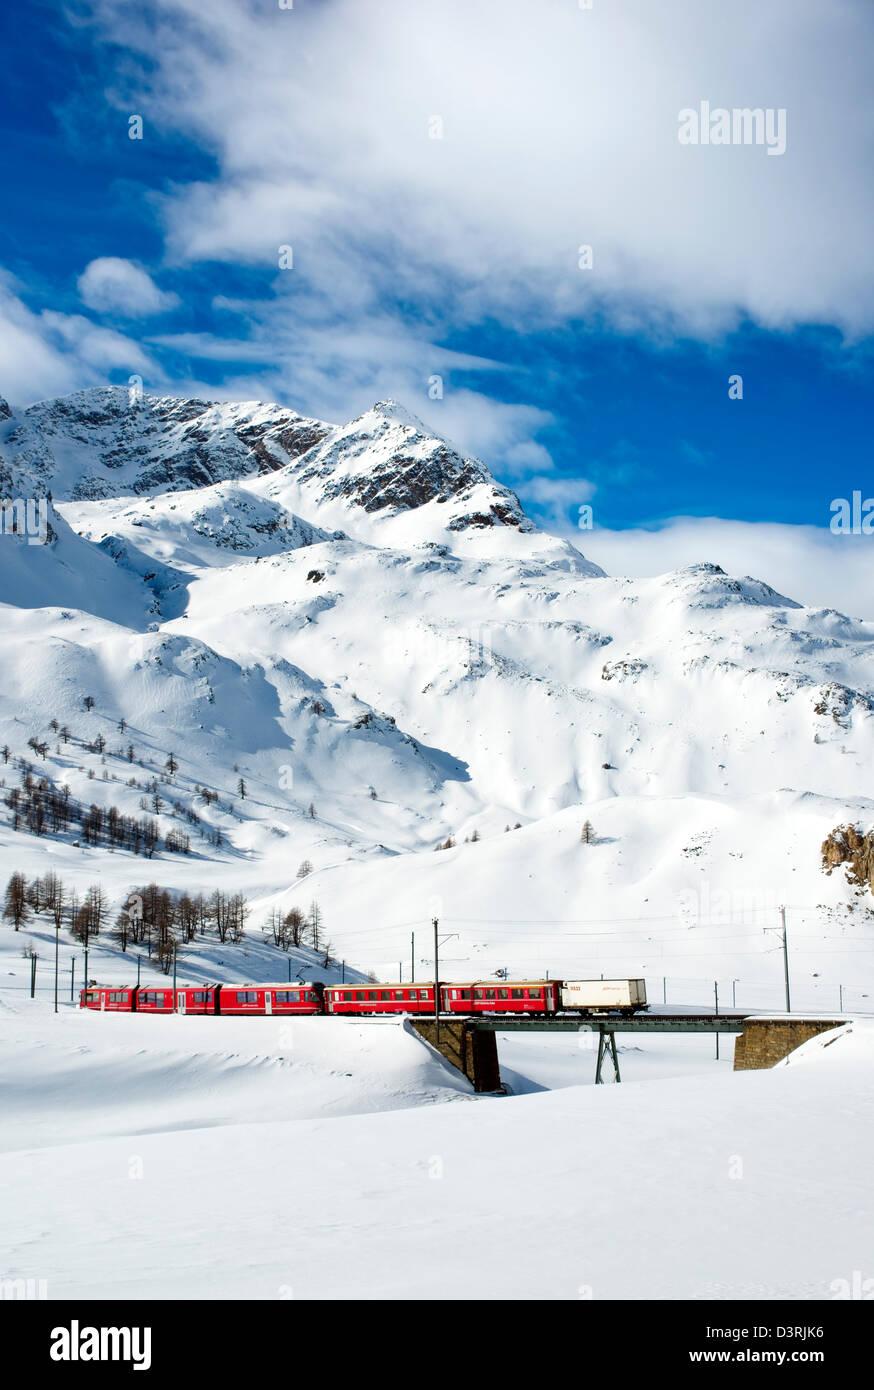 Tren de montaña en Lago Bianco Bernina Pase en invierno, Grisones, Suiza | Eisenbahn am Lago Bianco am Bernina Imagen De Stock